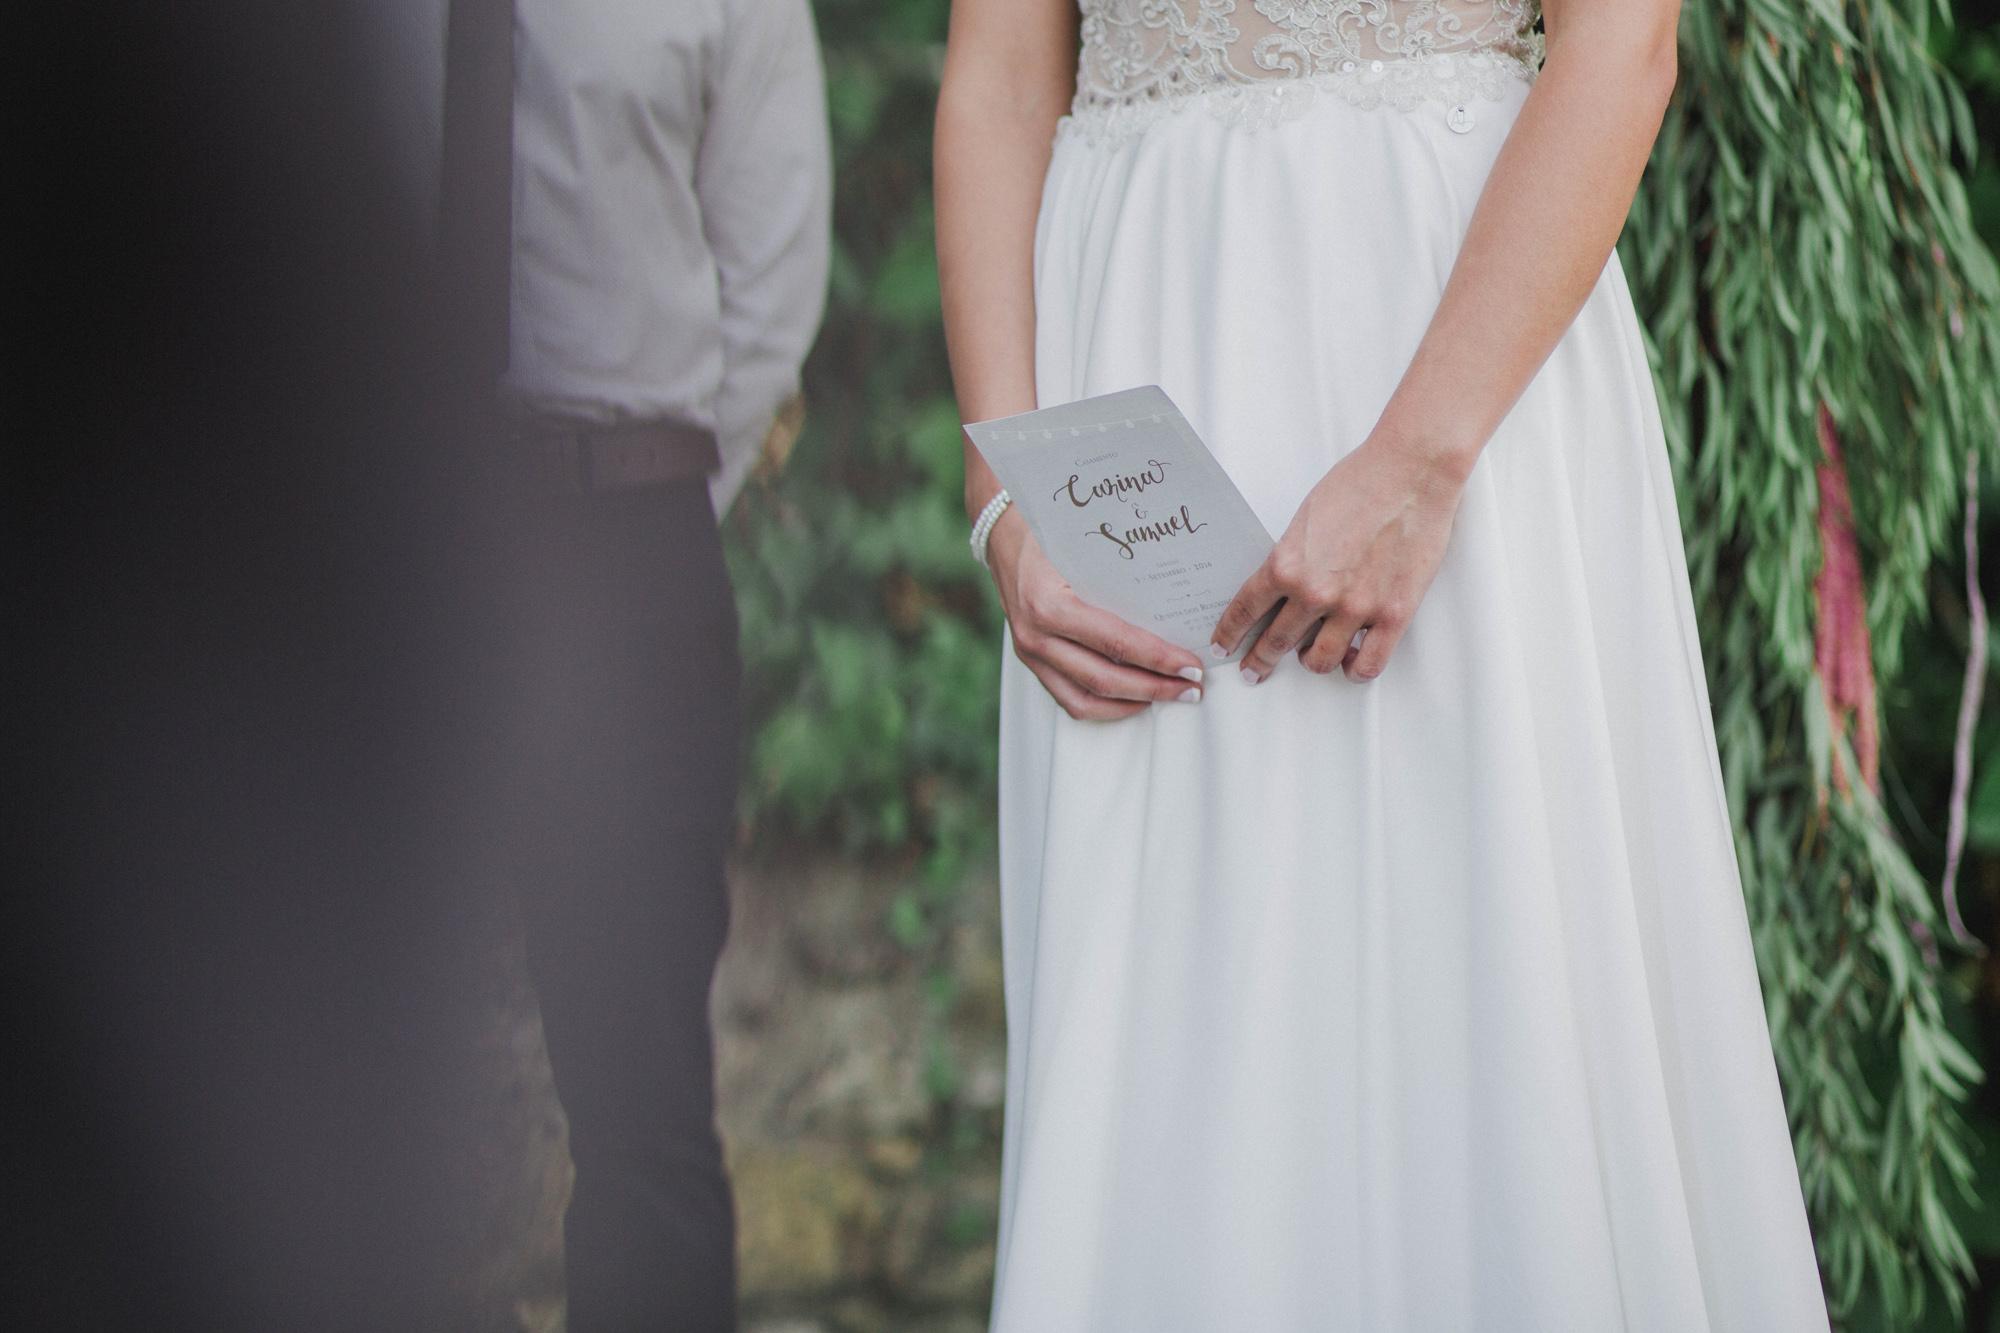 052-carina-e-samuel-wedding-casamento-quinta-dos-rouxinois-rustico-my-fancy-wedding-mafra-malveira-lisboa-sintra-cascais-filipe-santiago-fotografia-fotografo-lifestyle-destination-portugal